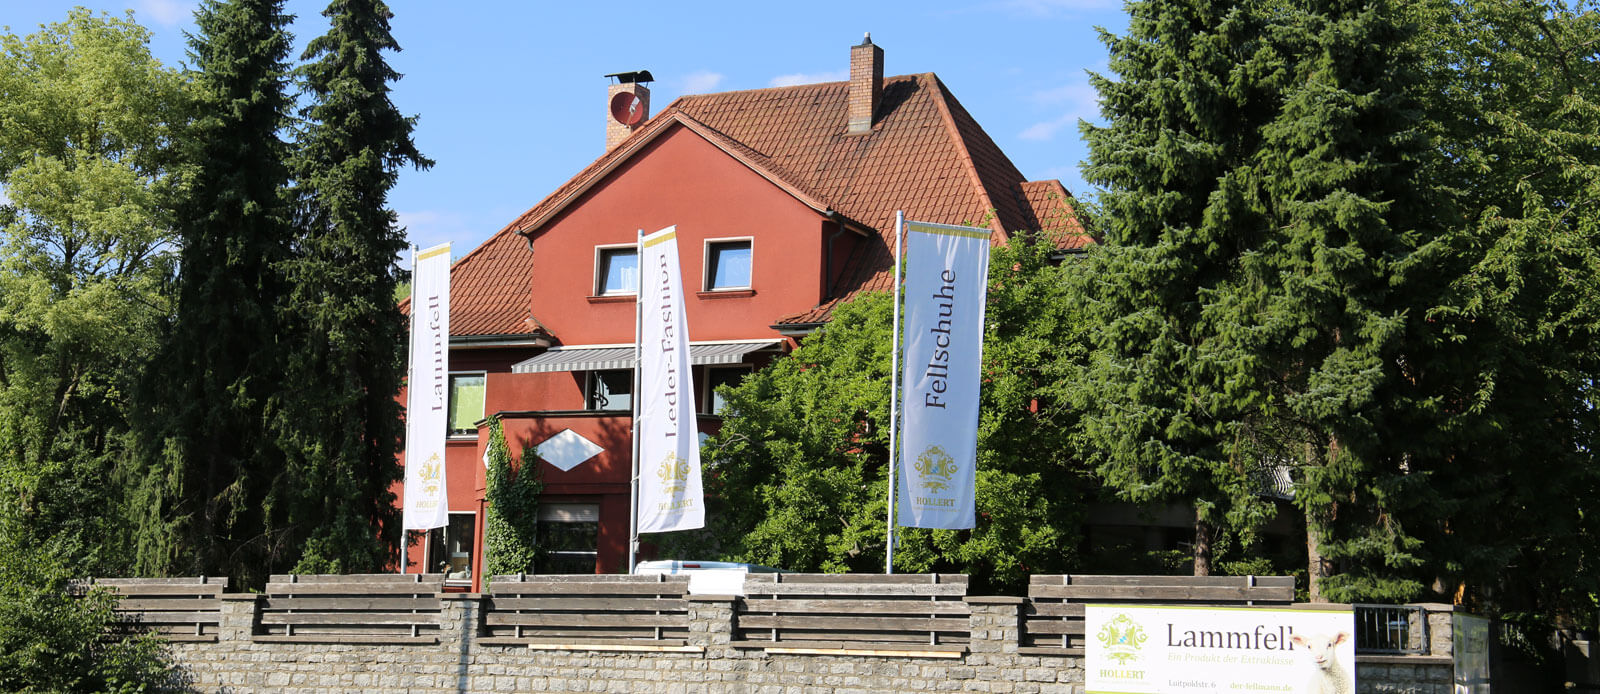 Der Fellmann Store Kulmbach